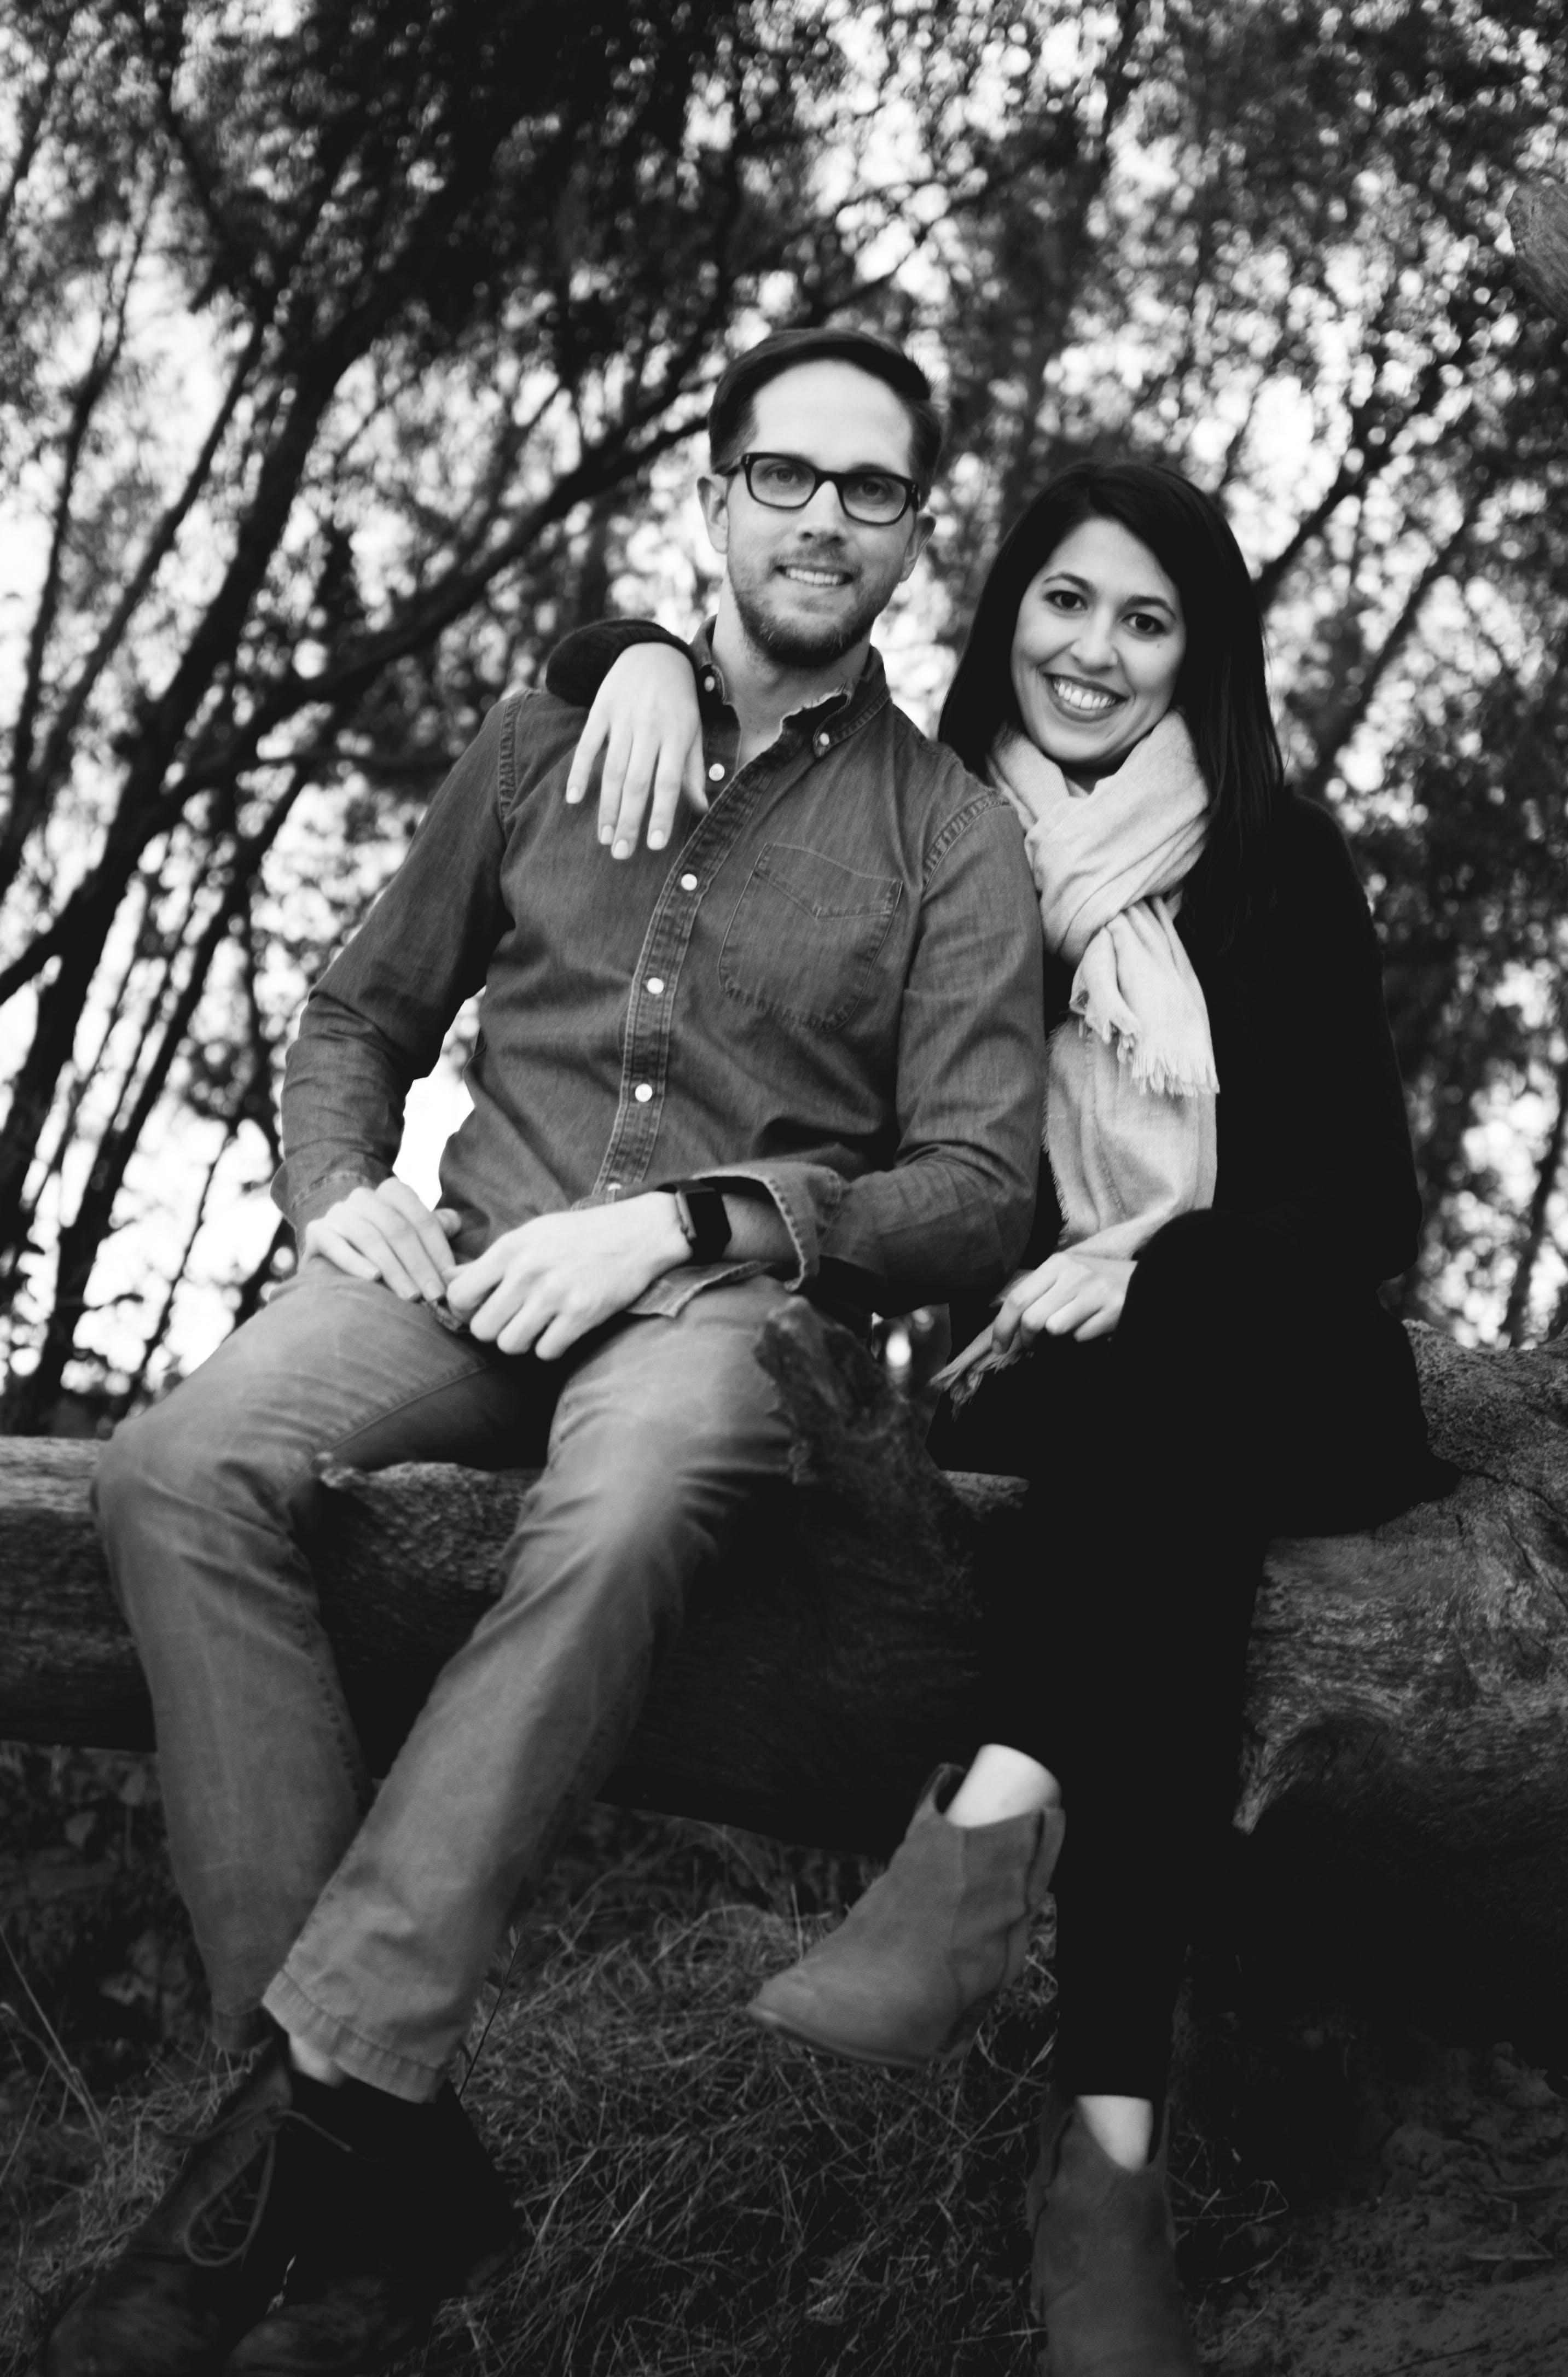 Fotos de stock gratuitas de abrazo de pareja, adulto, amor, anillo de compromiso